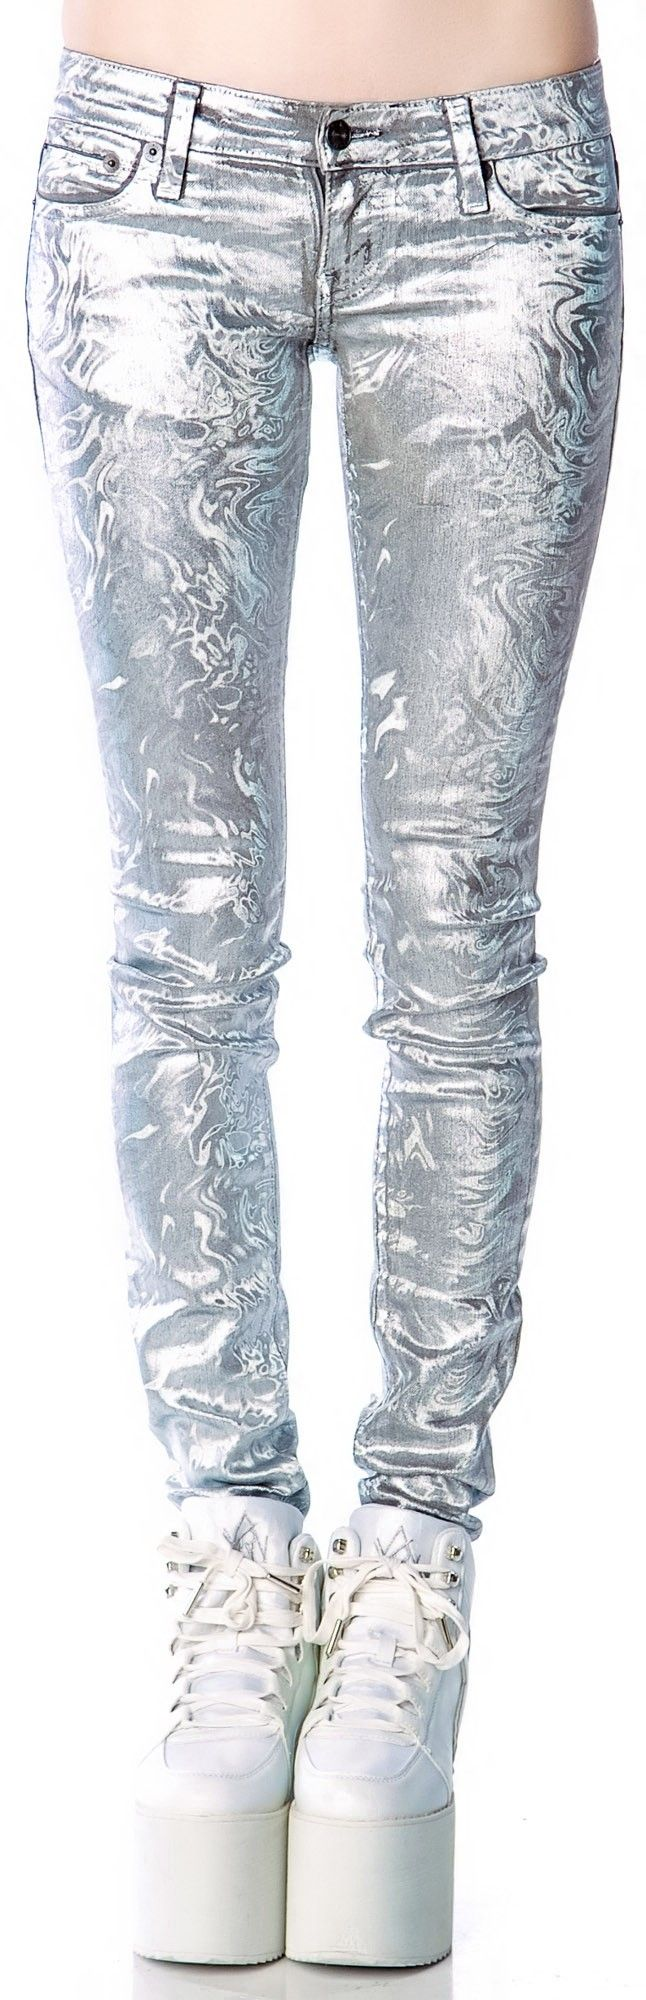 Kill City Melting Holographic Foil Junkie Jeans   Dolls Kill